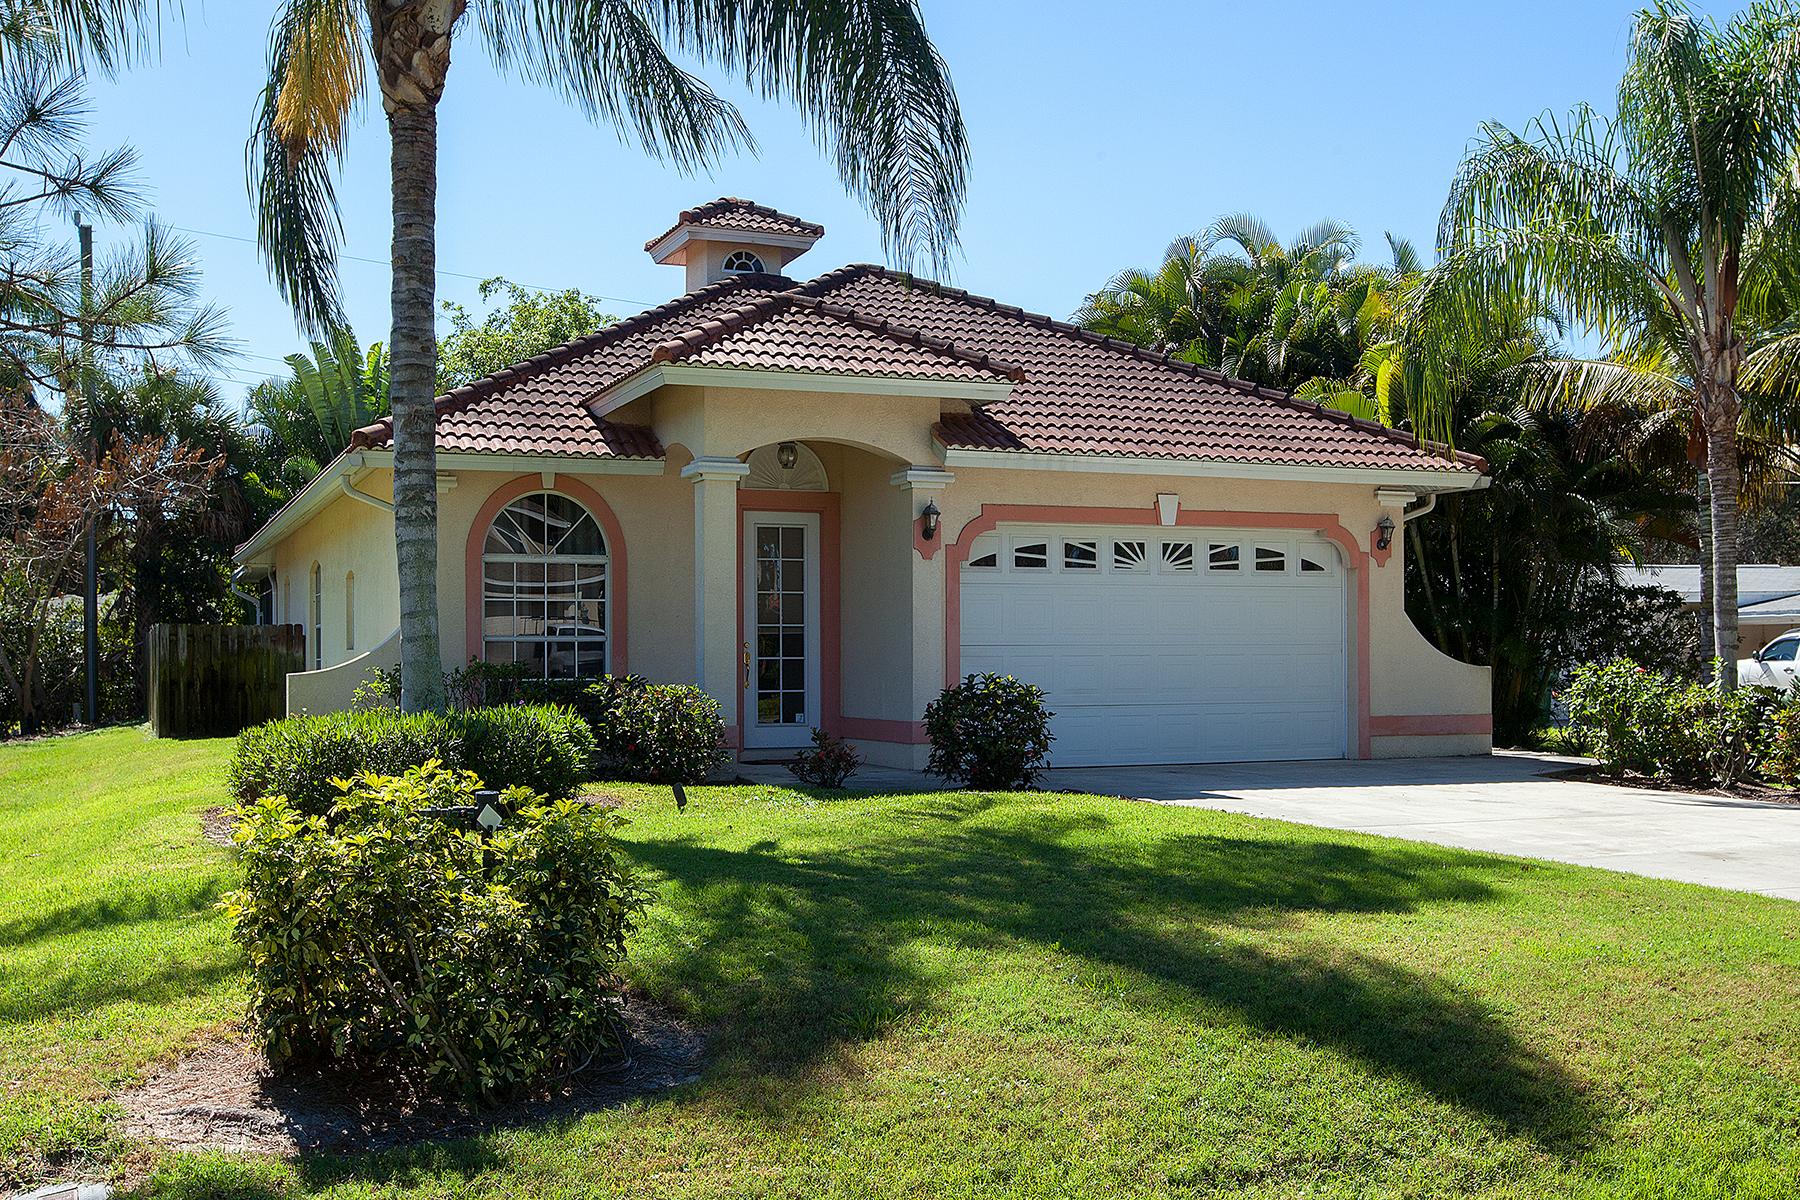 Casa para uma família para Venda às BAD AXE 1024 Michigan Ave Naples, Florida, 34103 Estados Unidos